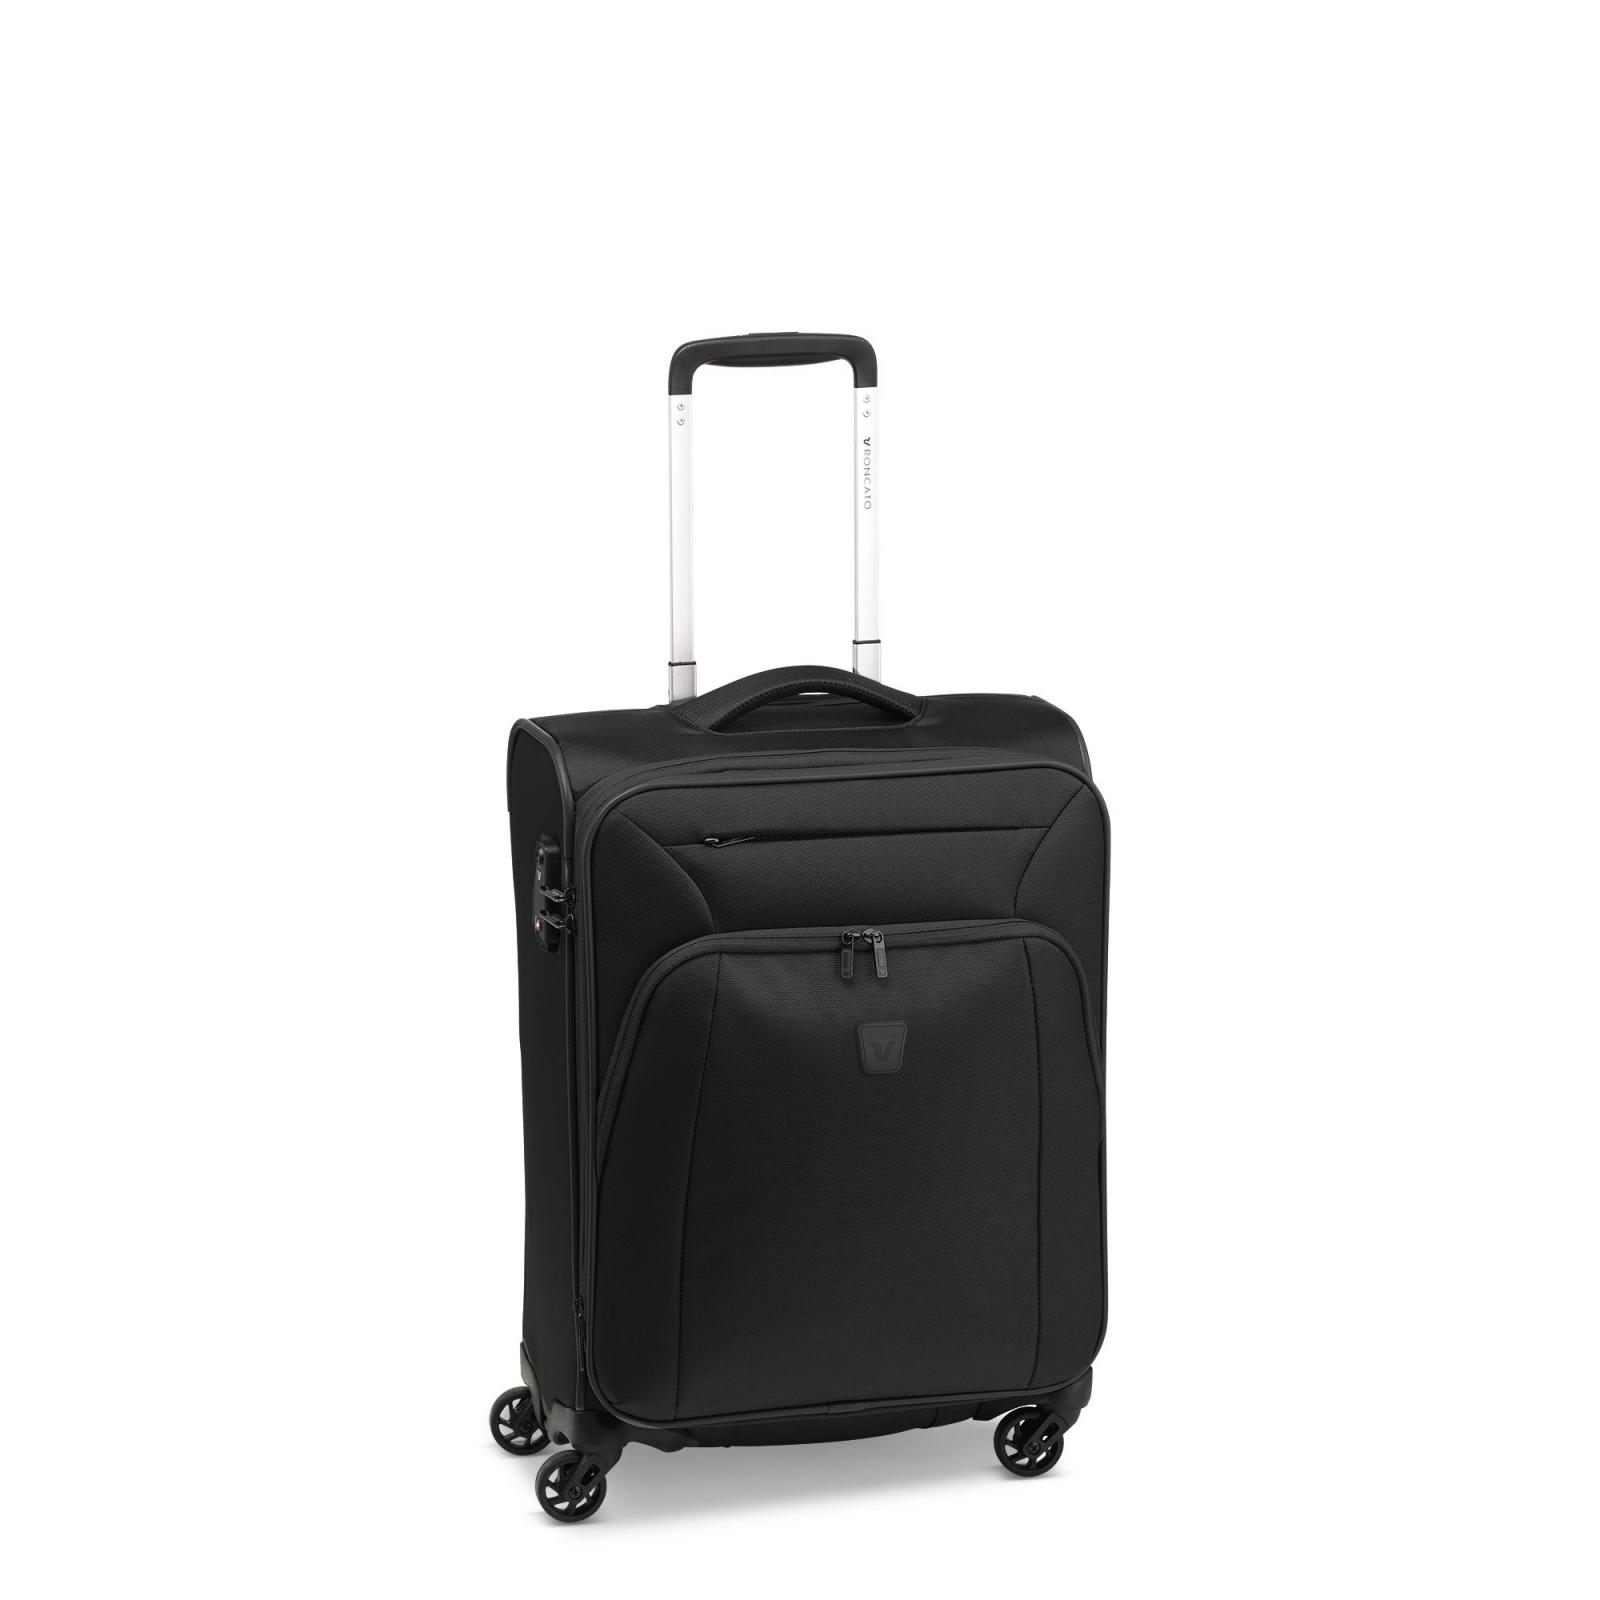 Trolley Cabin Case Element 55/20-NERO-UN